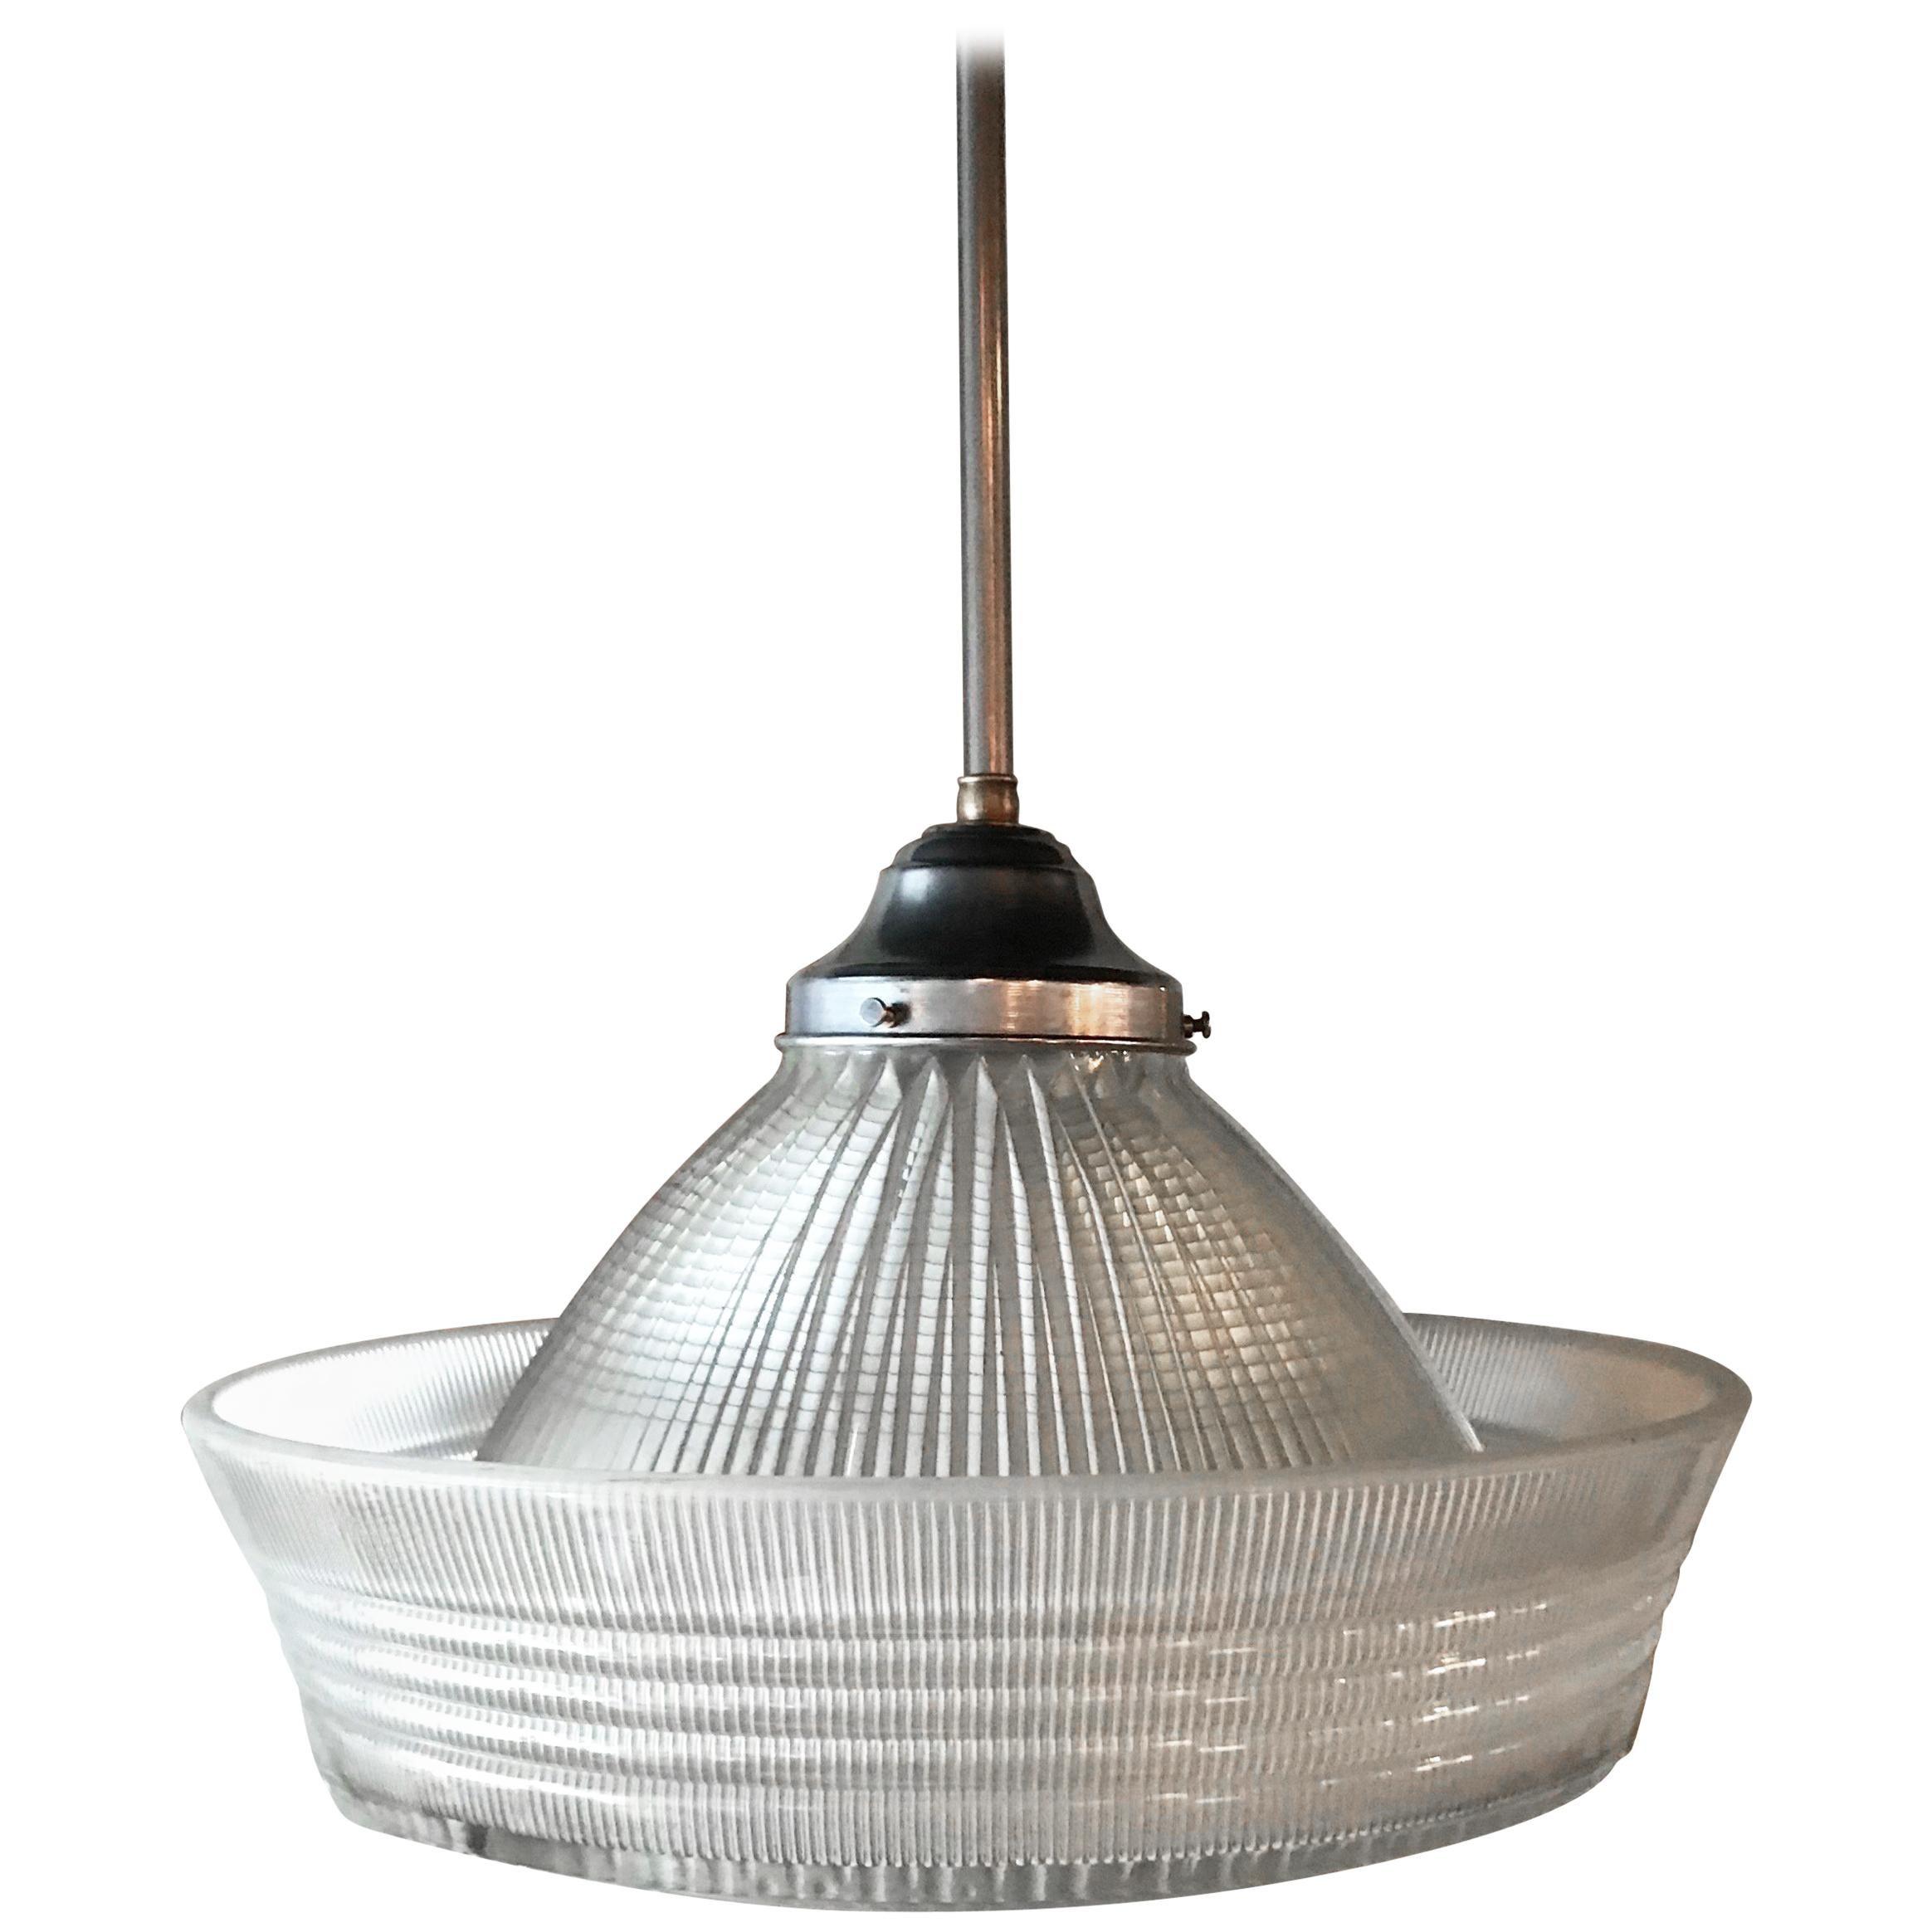 Industrial Brimmed Dome Prismatic Holophane Pendant Light